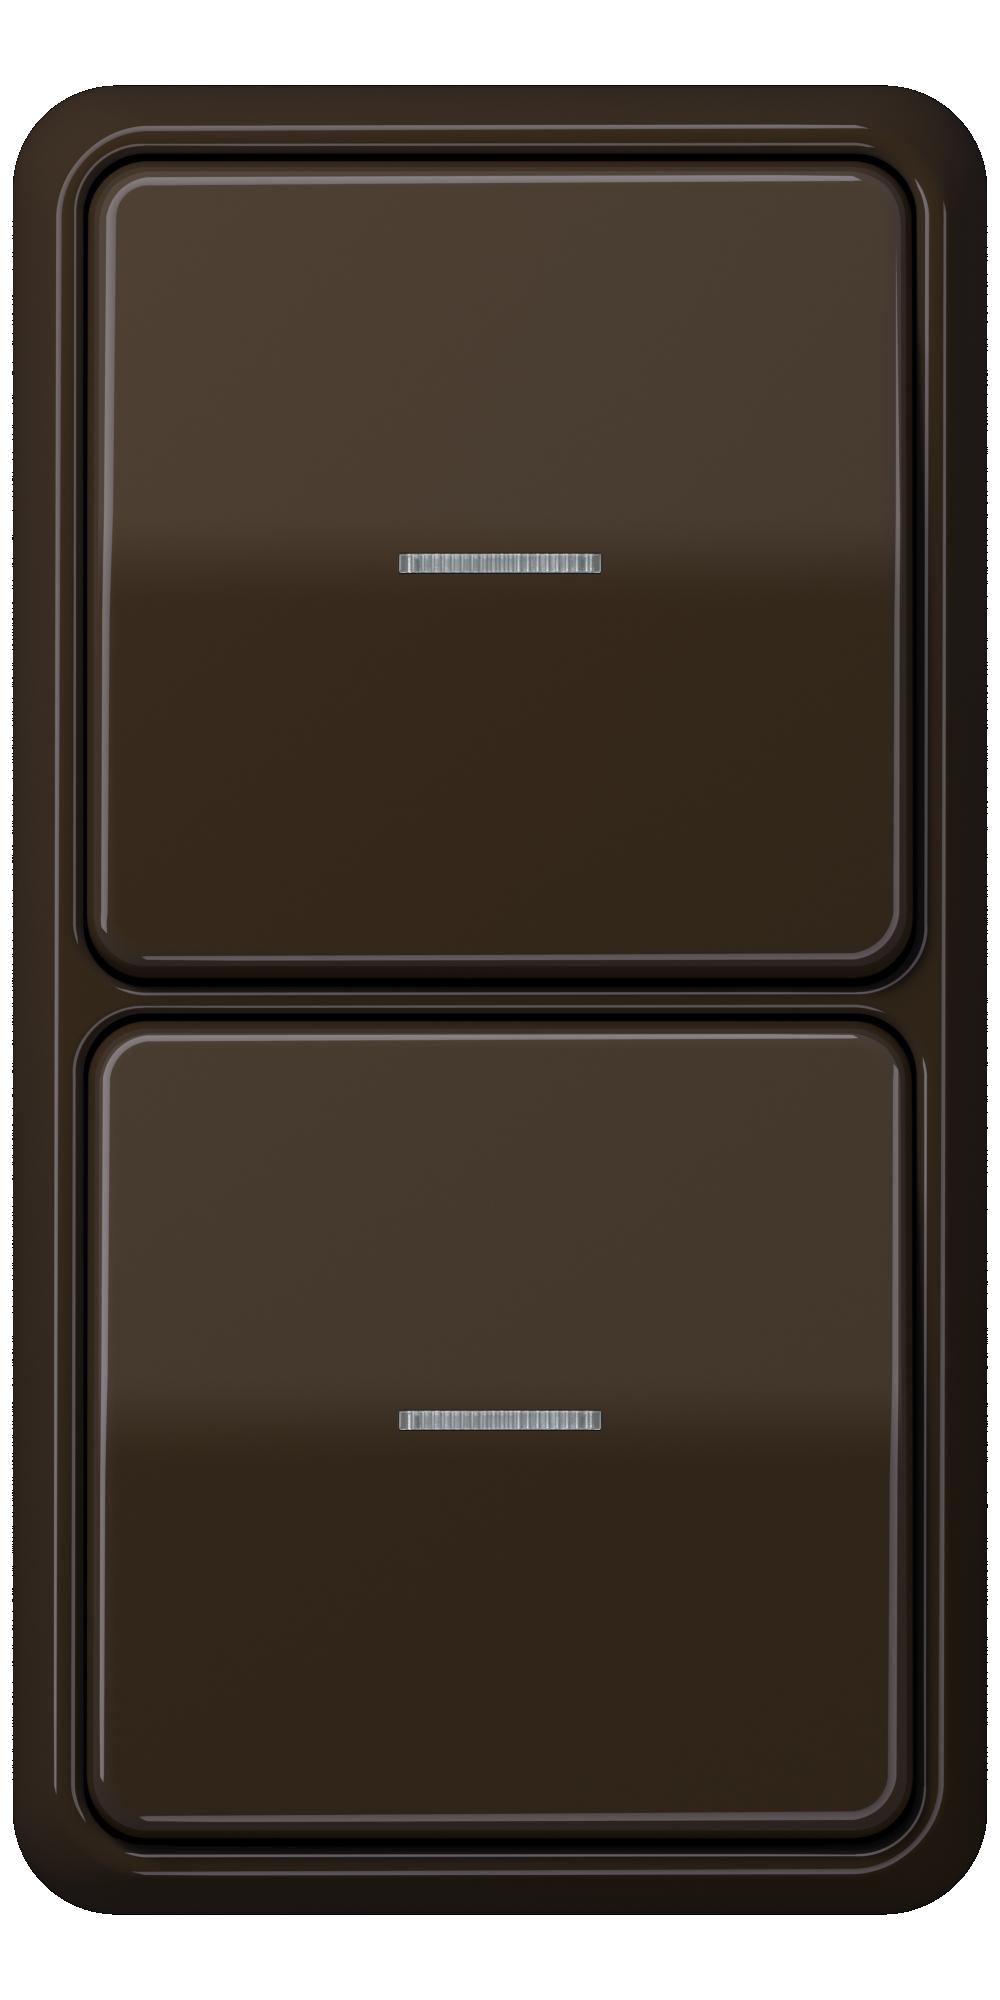 JUNG_CD500_brown_switch-lense_switch-lense